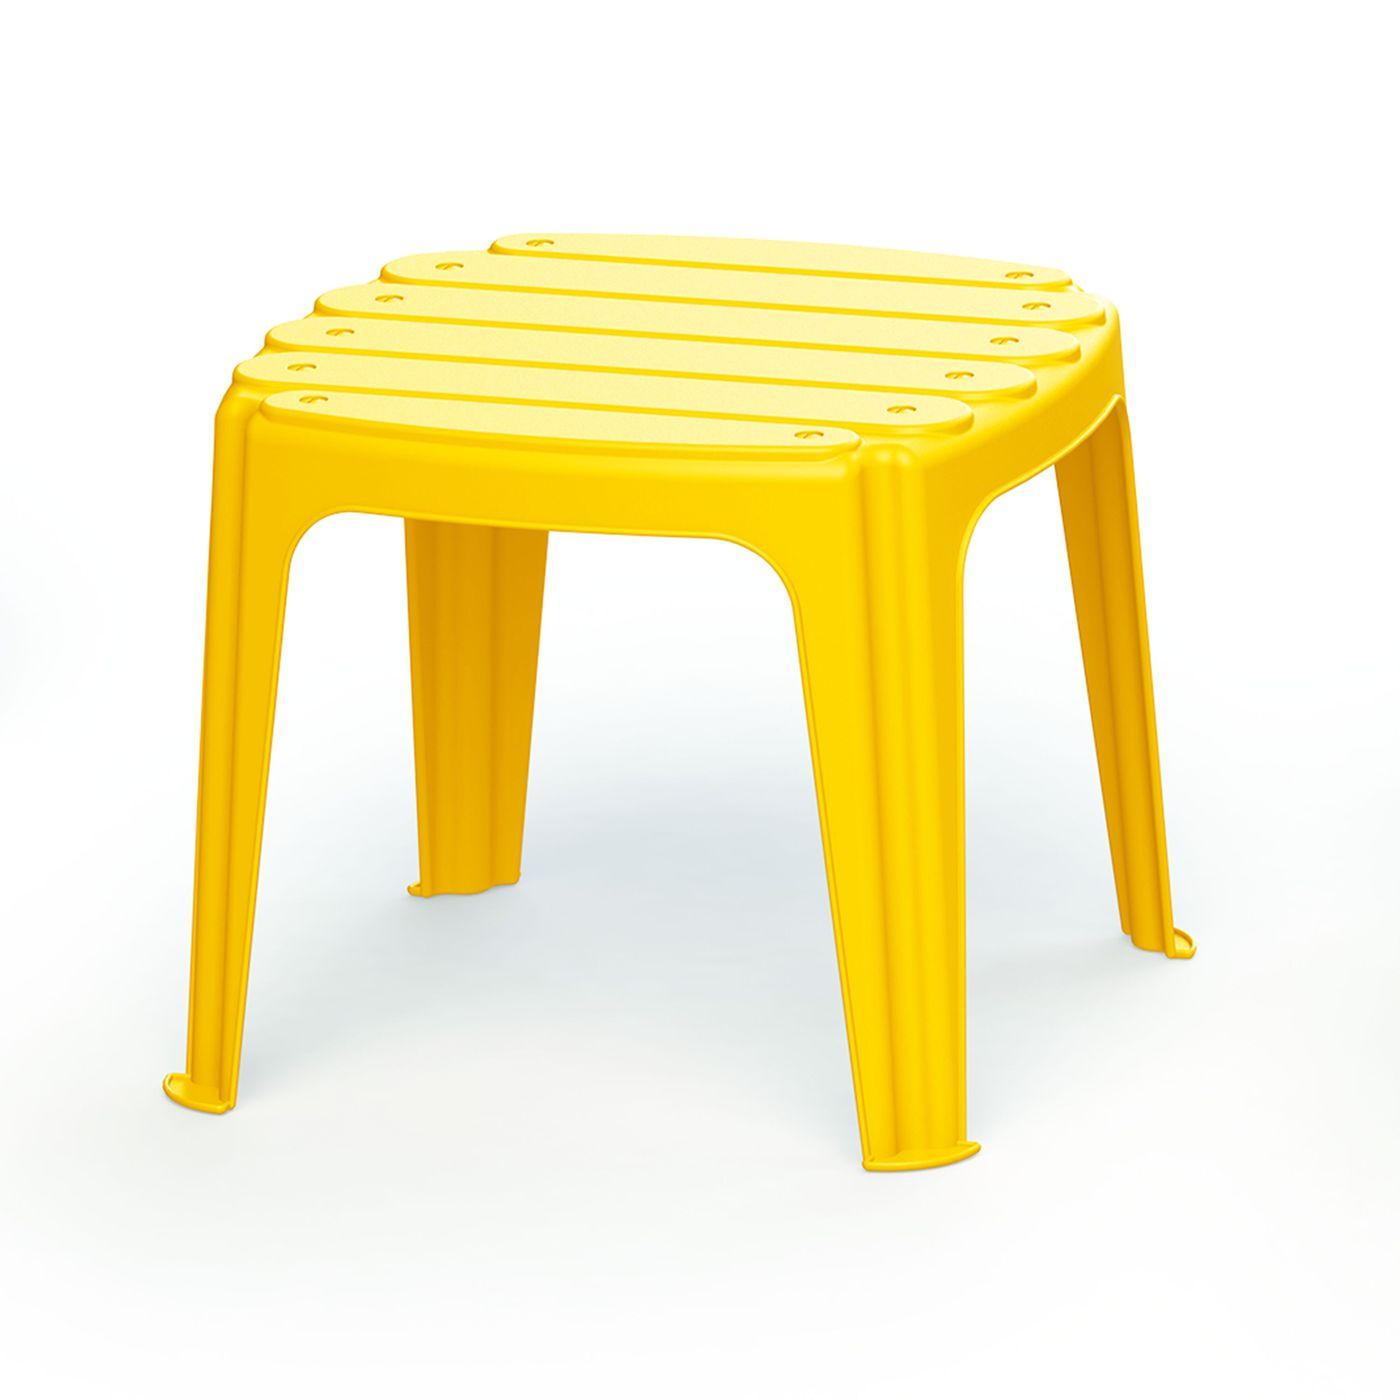 Детский стол Dolu, пластмассовый, 36,5 х 36,5 х 30,5 см, цвет: желтый. DL_3207